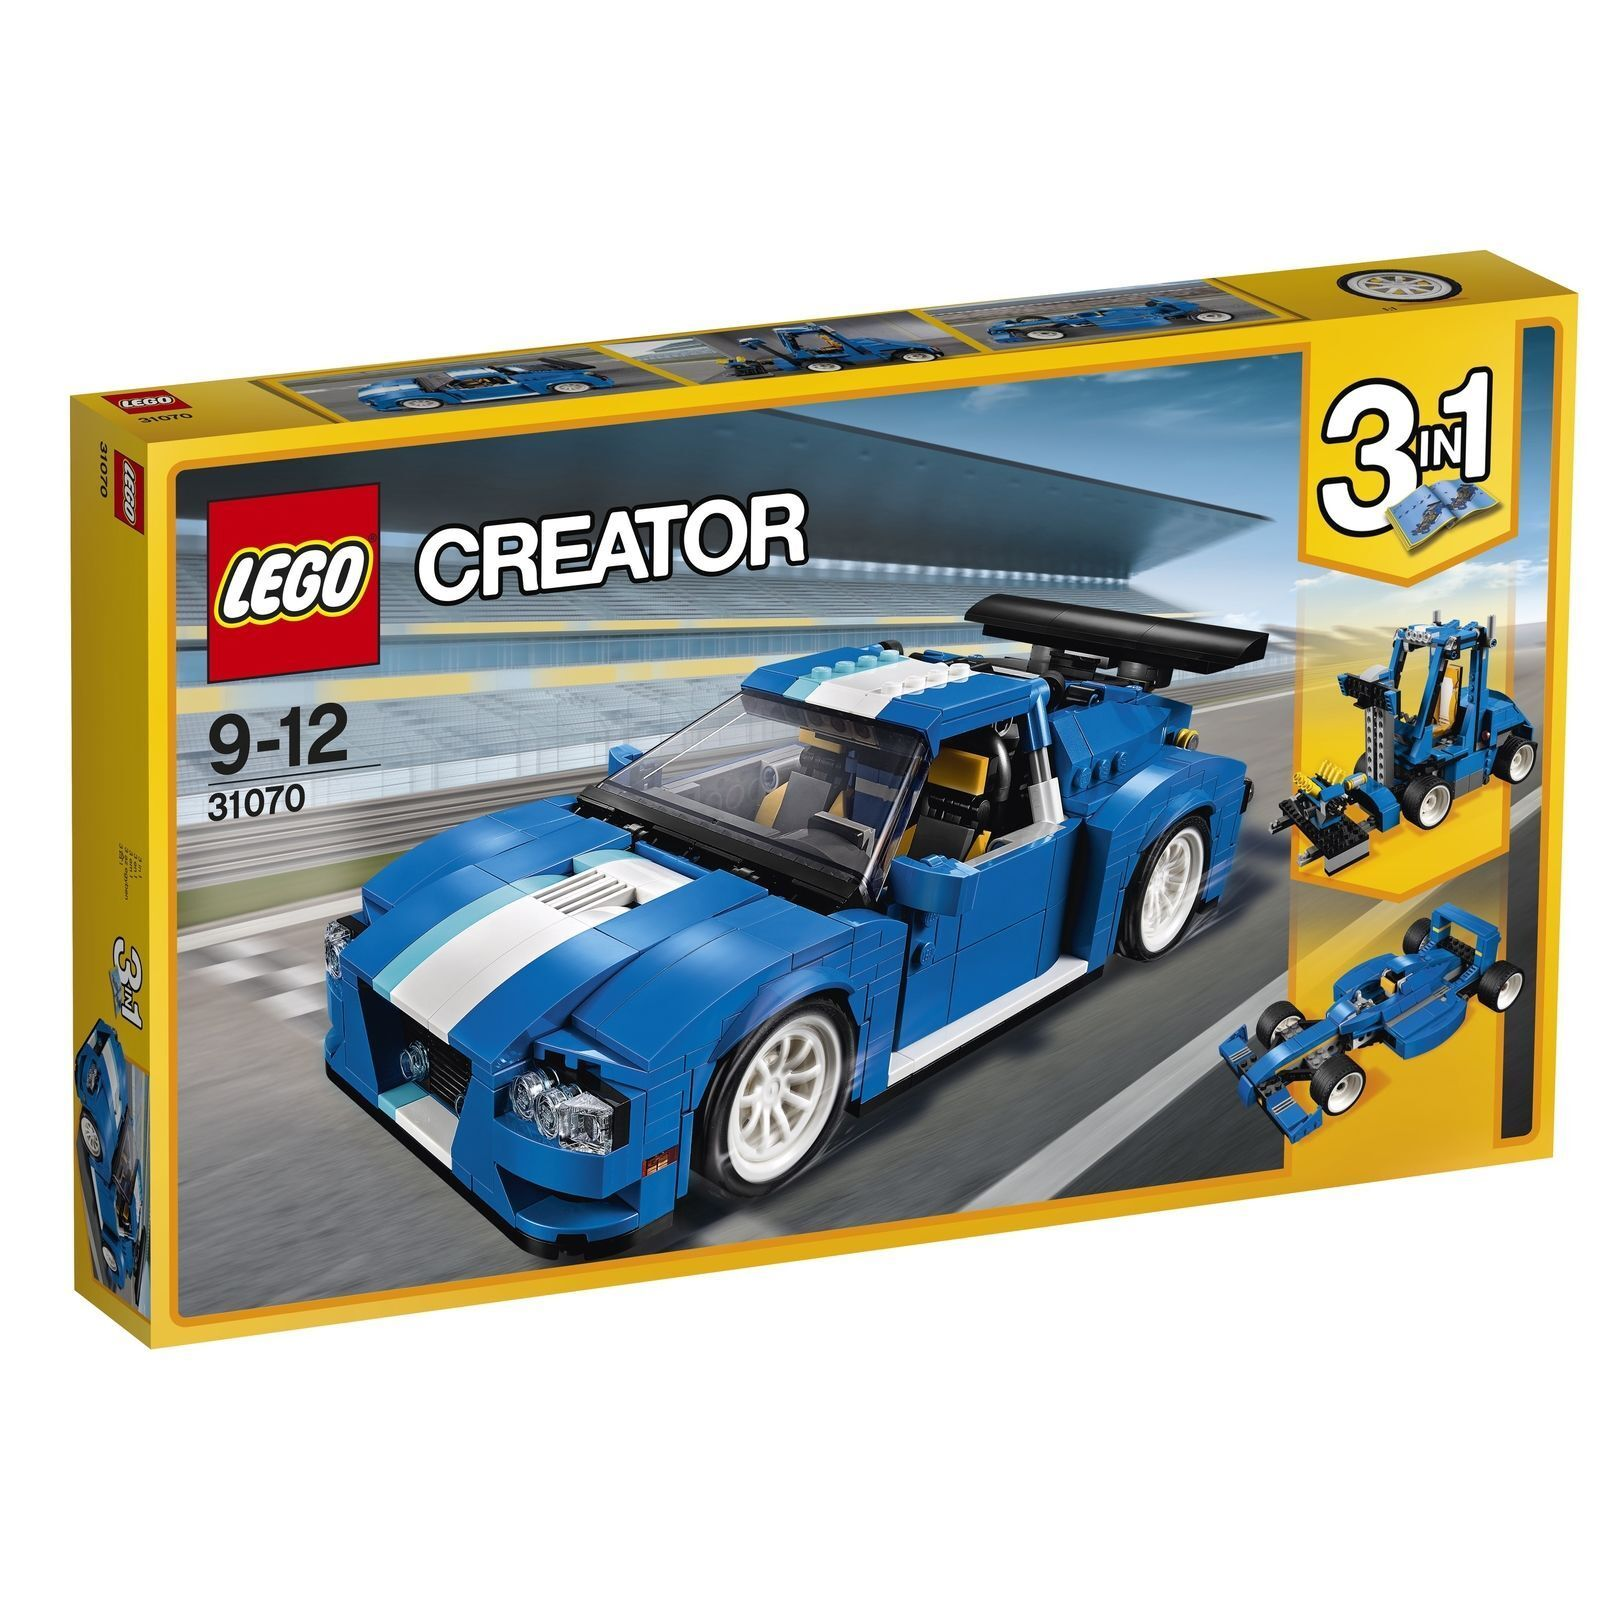 LEGO® Creator 31070  Turborennwagen  3in1 Modell Lernen Kreativität NEU OVP